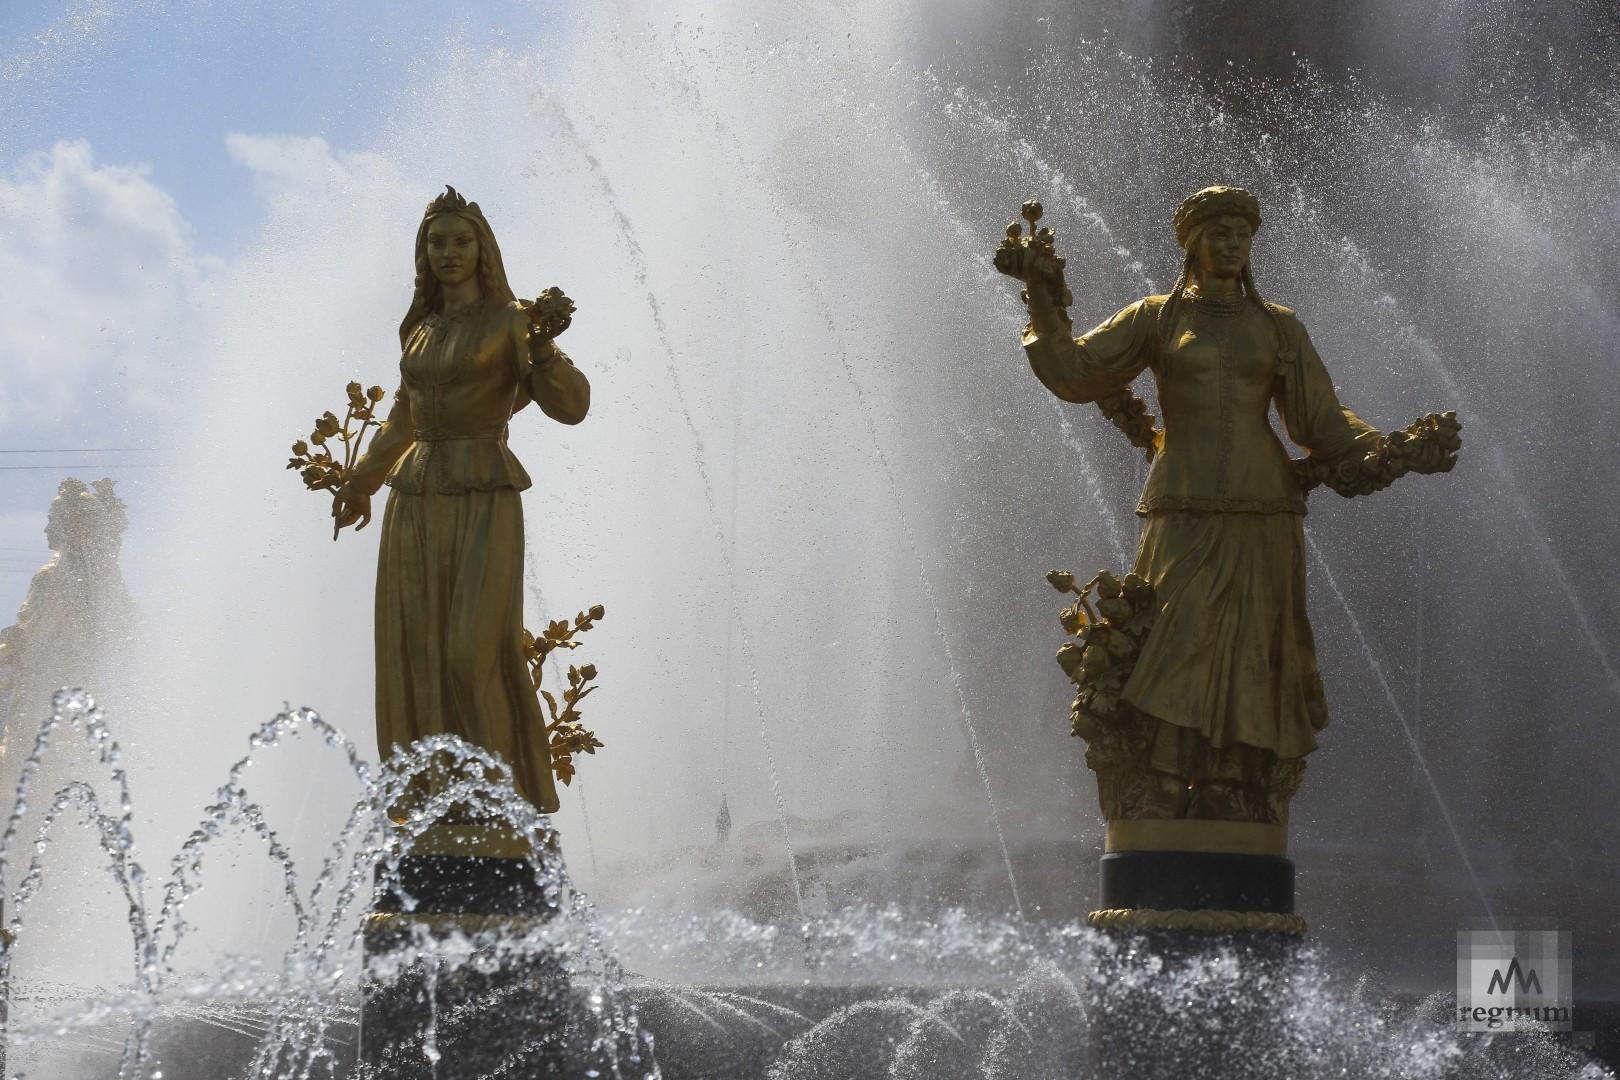 Фонтан «Дружба народов». ВДНХ. Москва